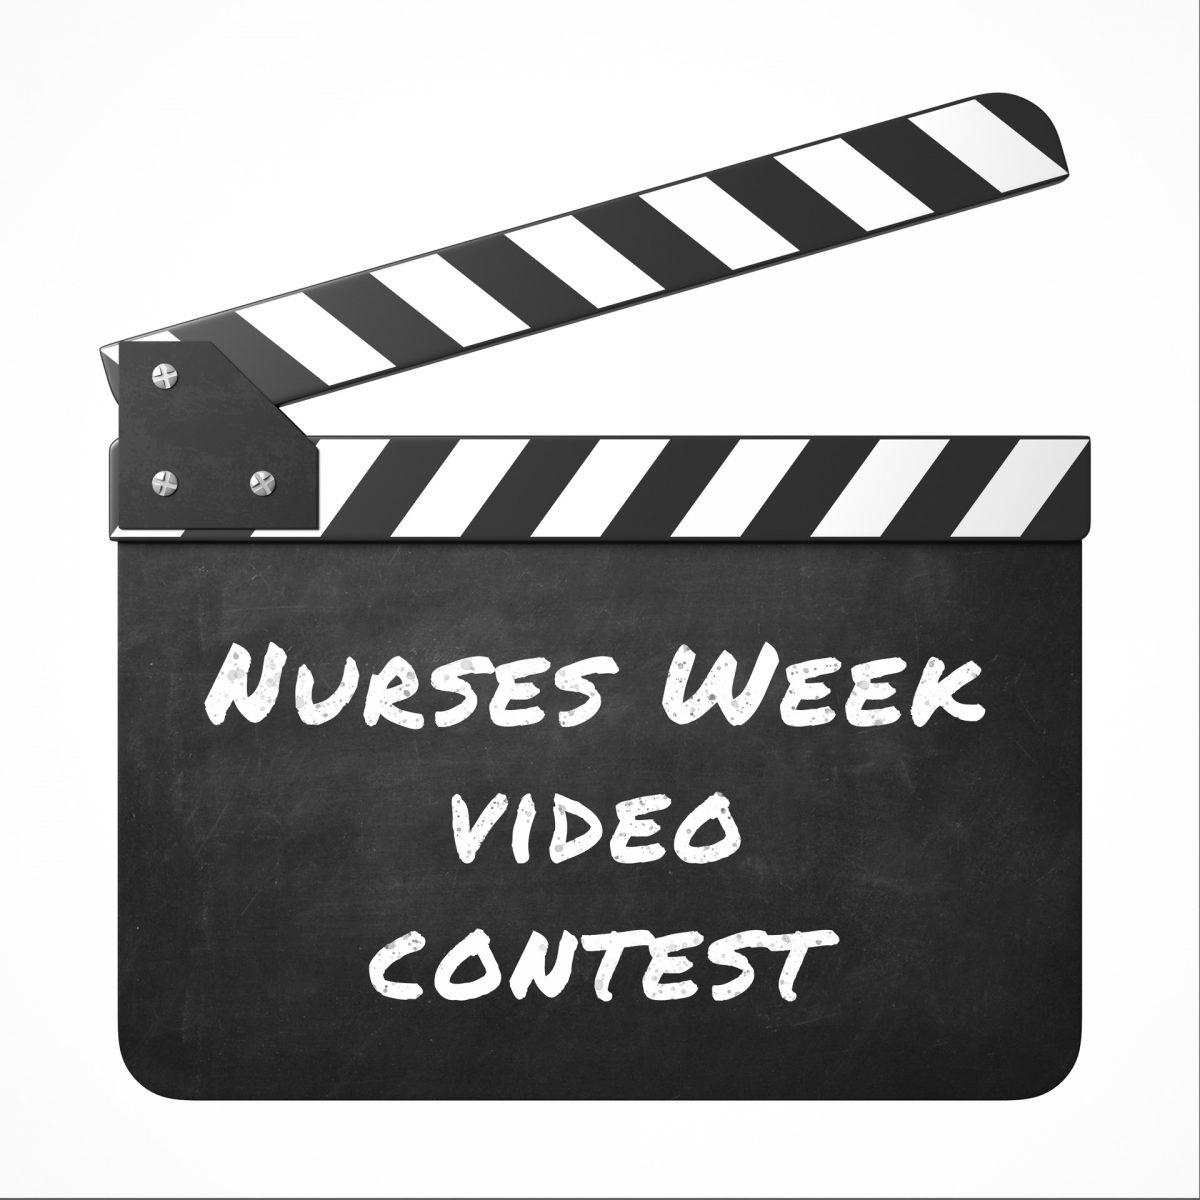 Nurses Week Video Contest